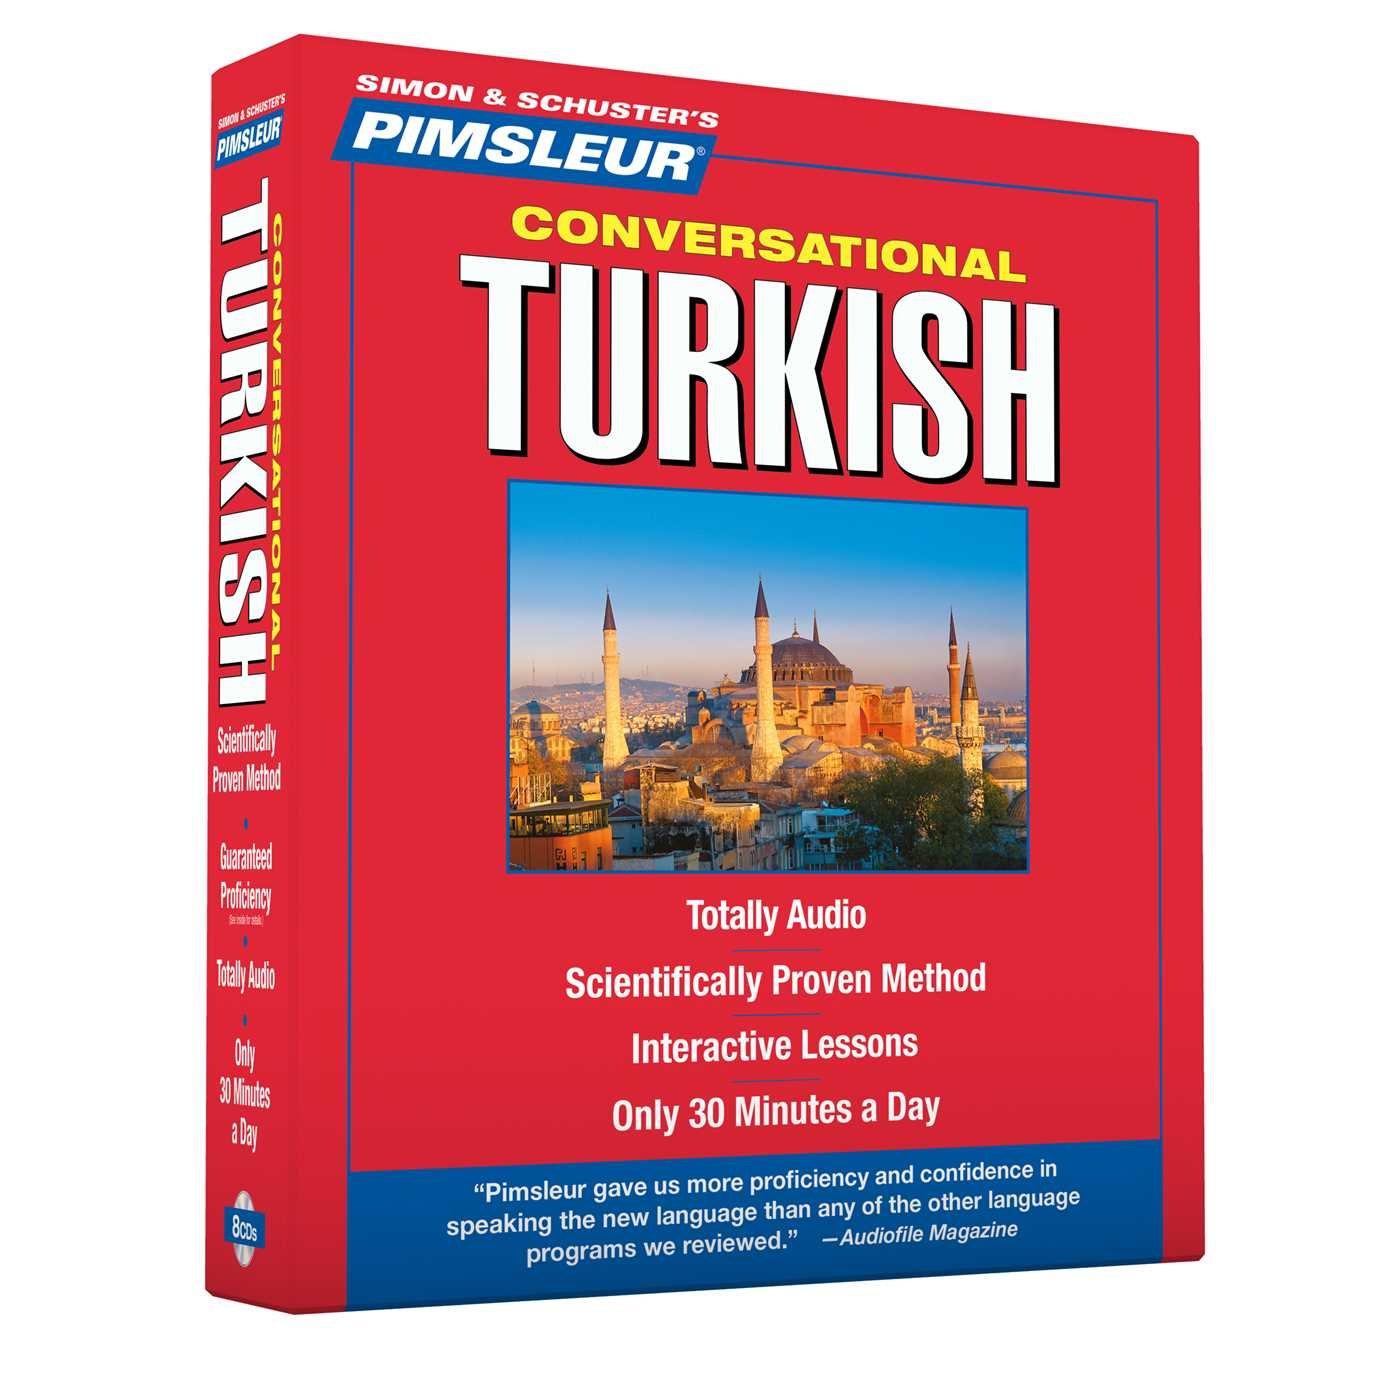 New 8 CD Pimsleur Learn to Speak Turkish Language Language 16 Lessons